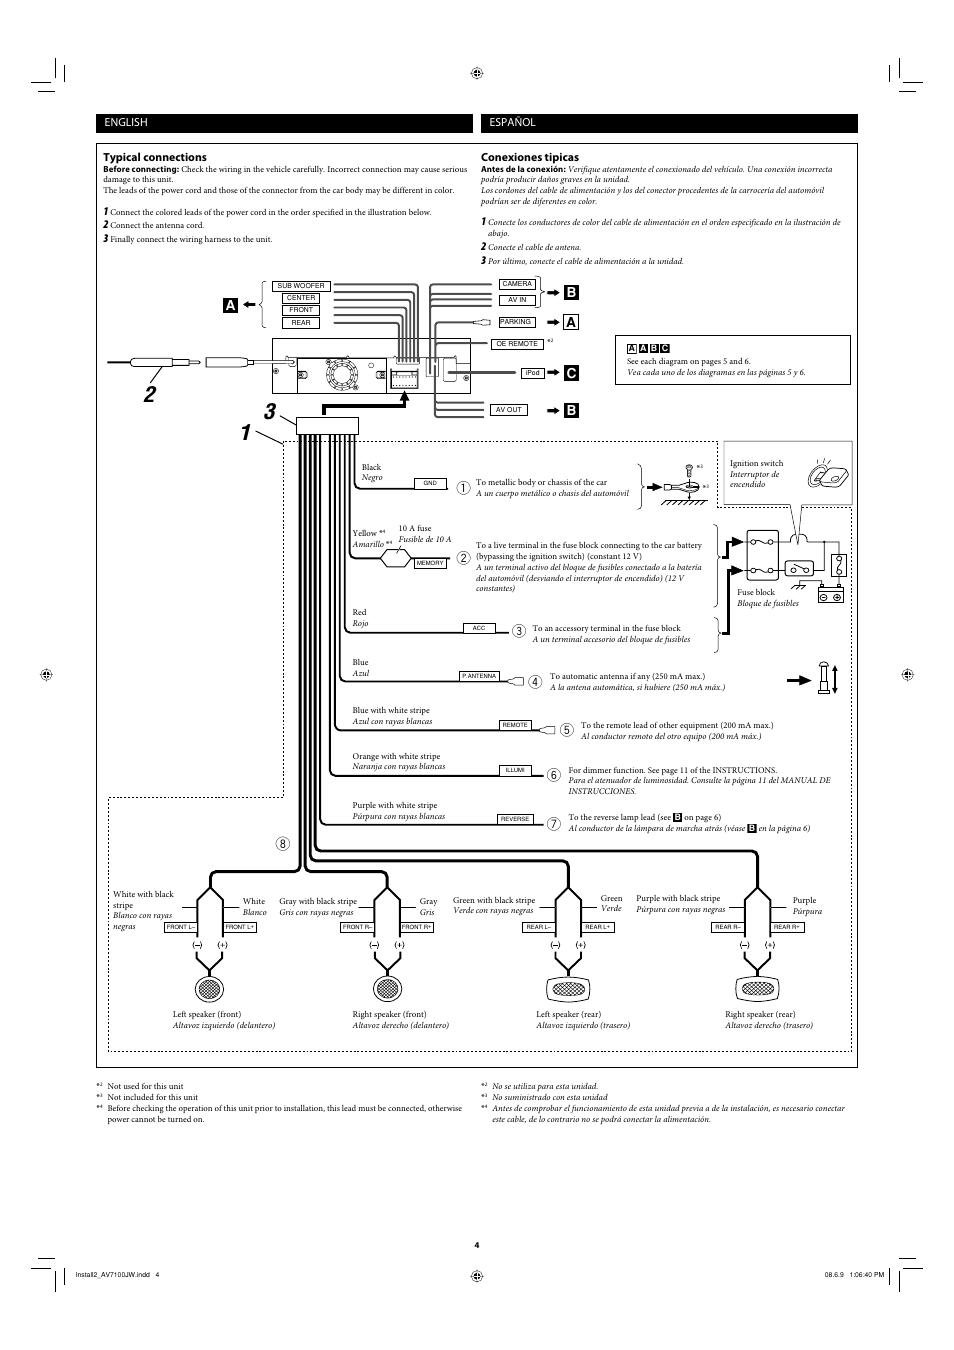 Ab c a | JVC KD-AV7100 User Manual | Page 4 / 6